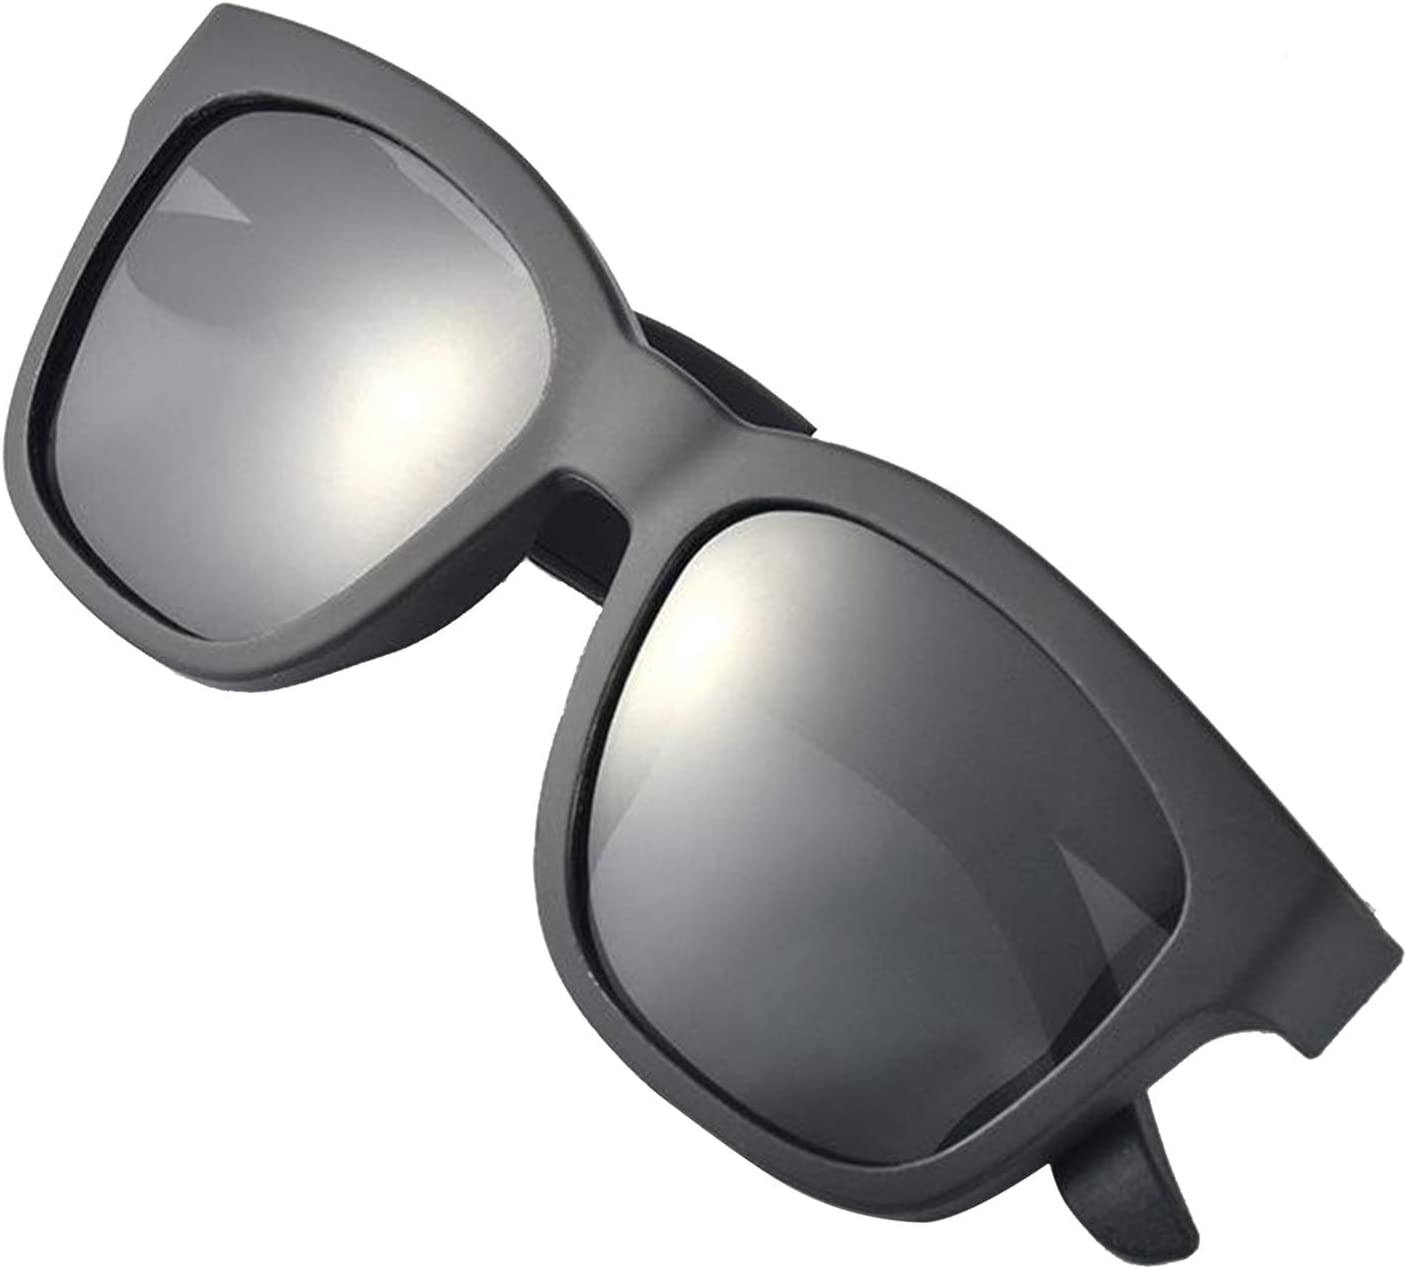 Black Audio Sunglasses Smart Bluetooth MP3 Headset Glasses Handfree,Light Weight